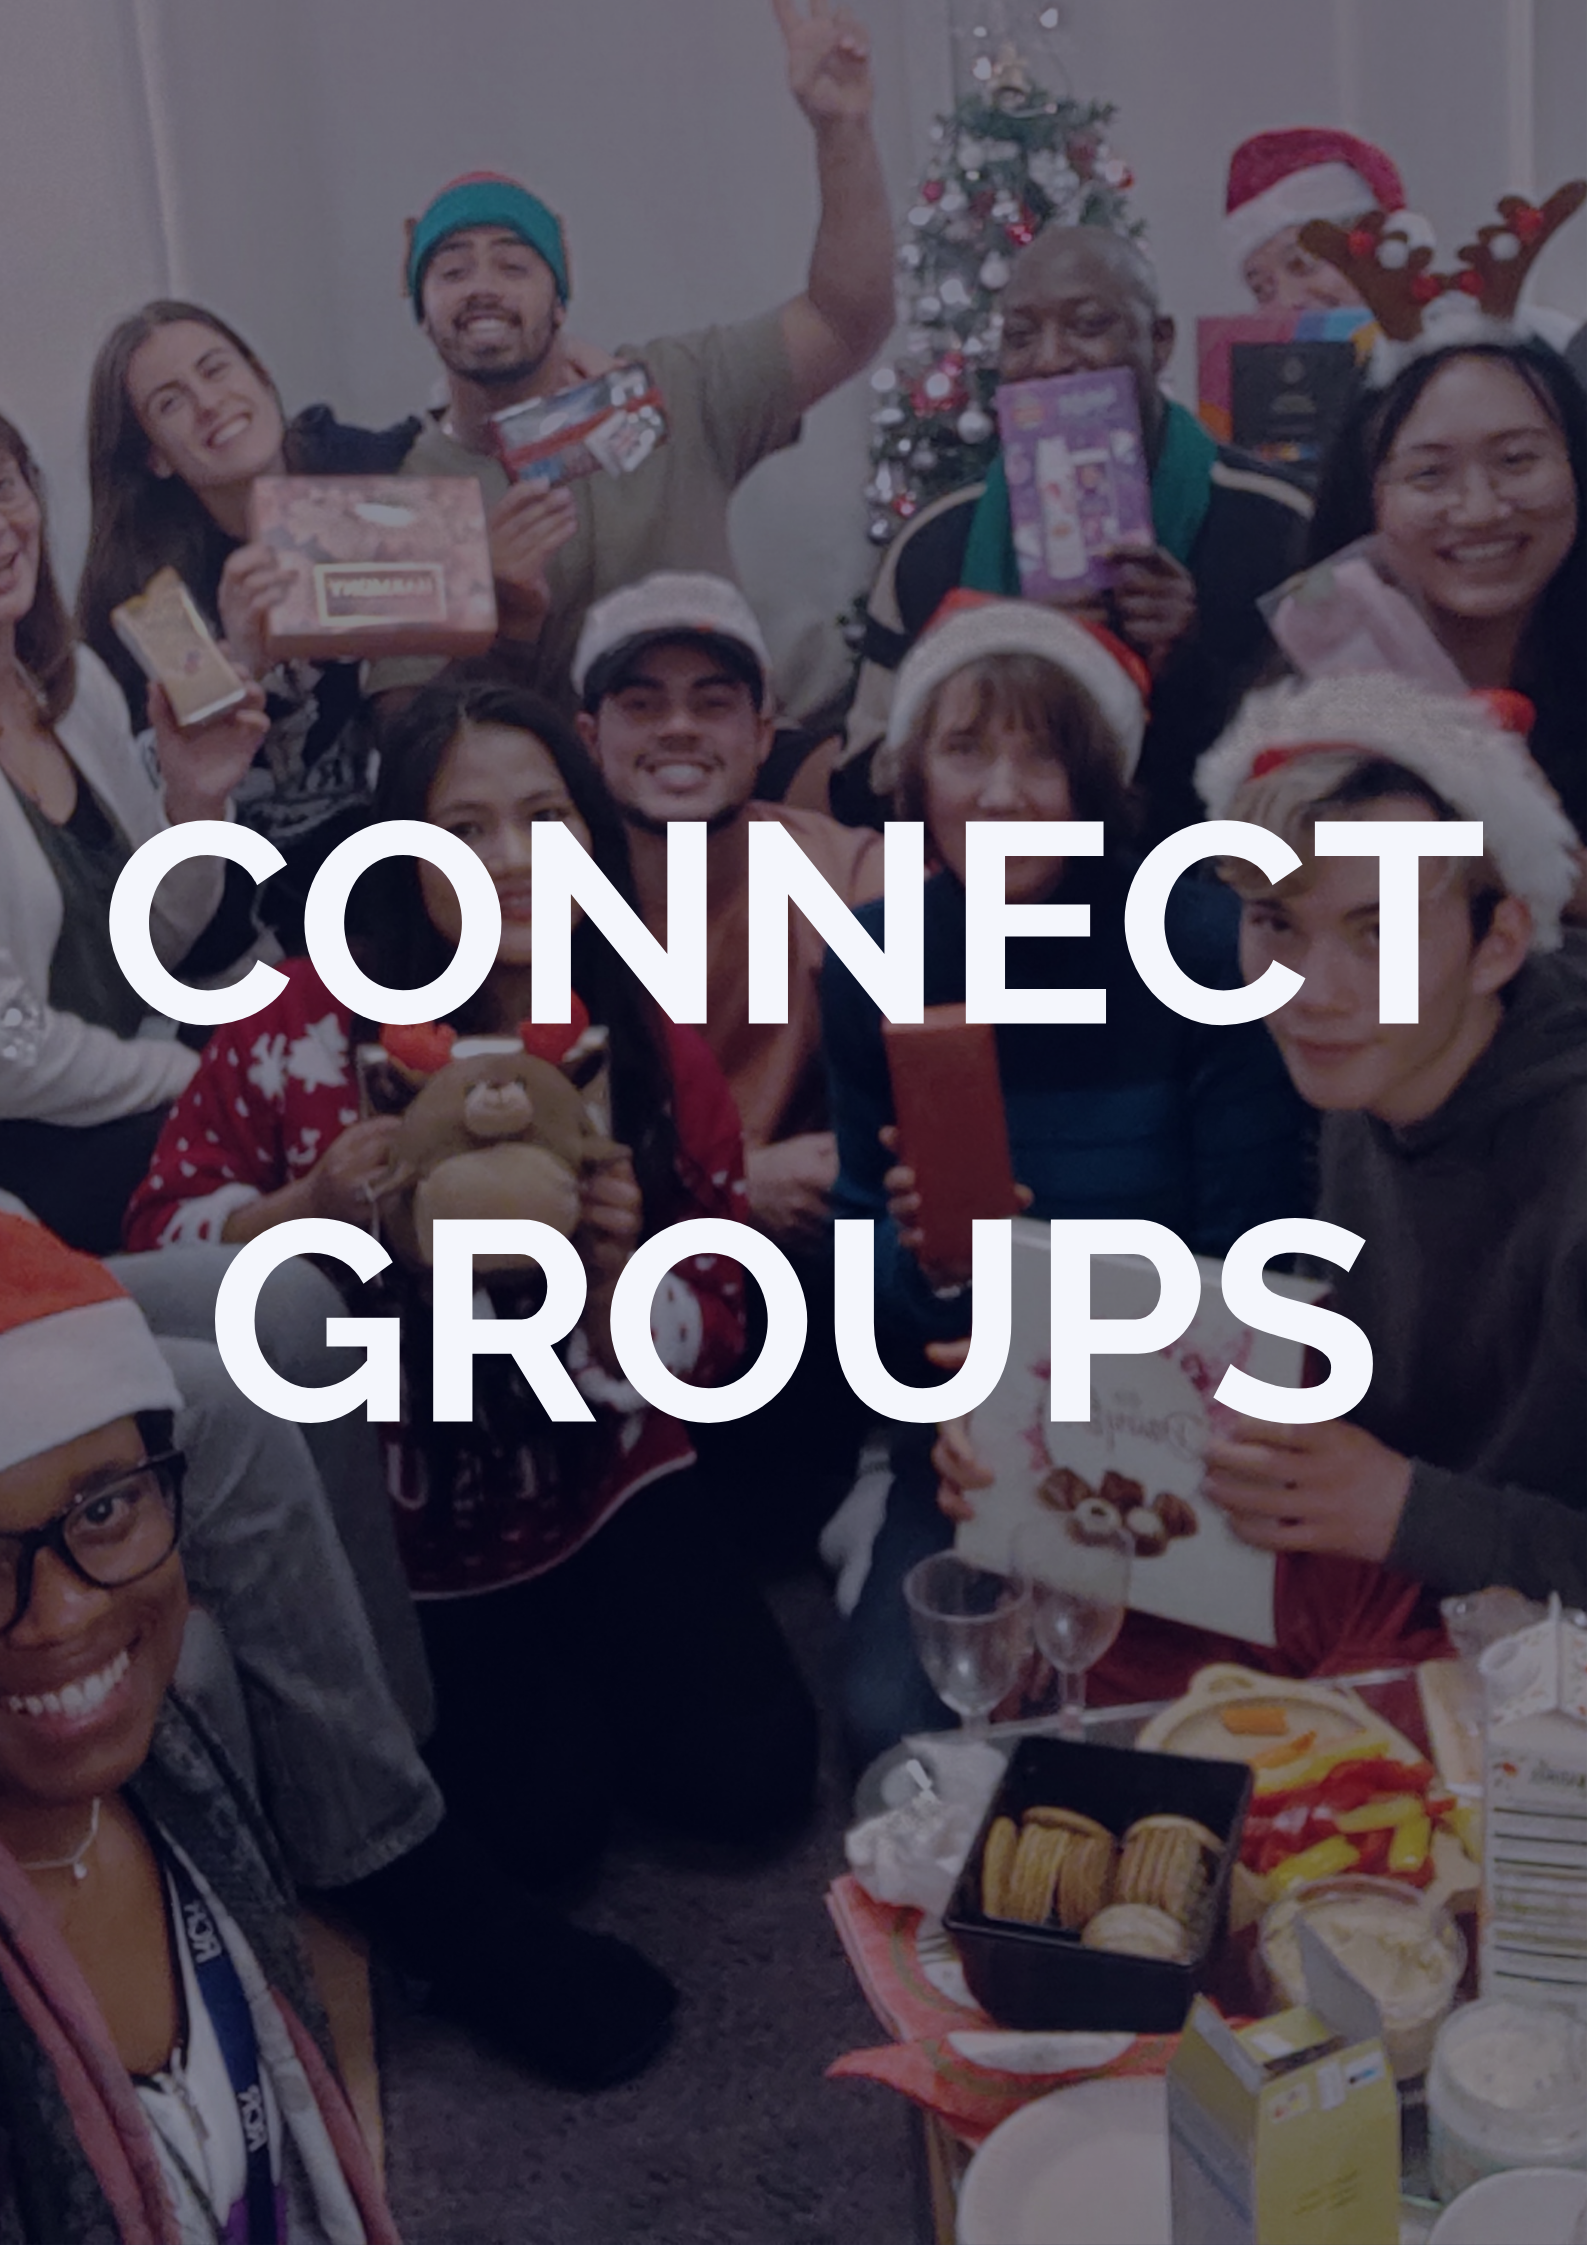 https://www.encounterchurch.uk/connect-groups